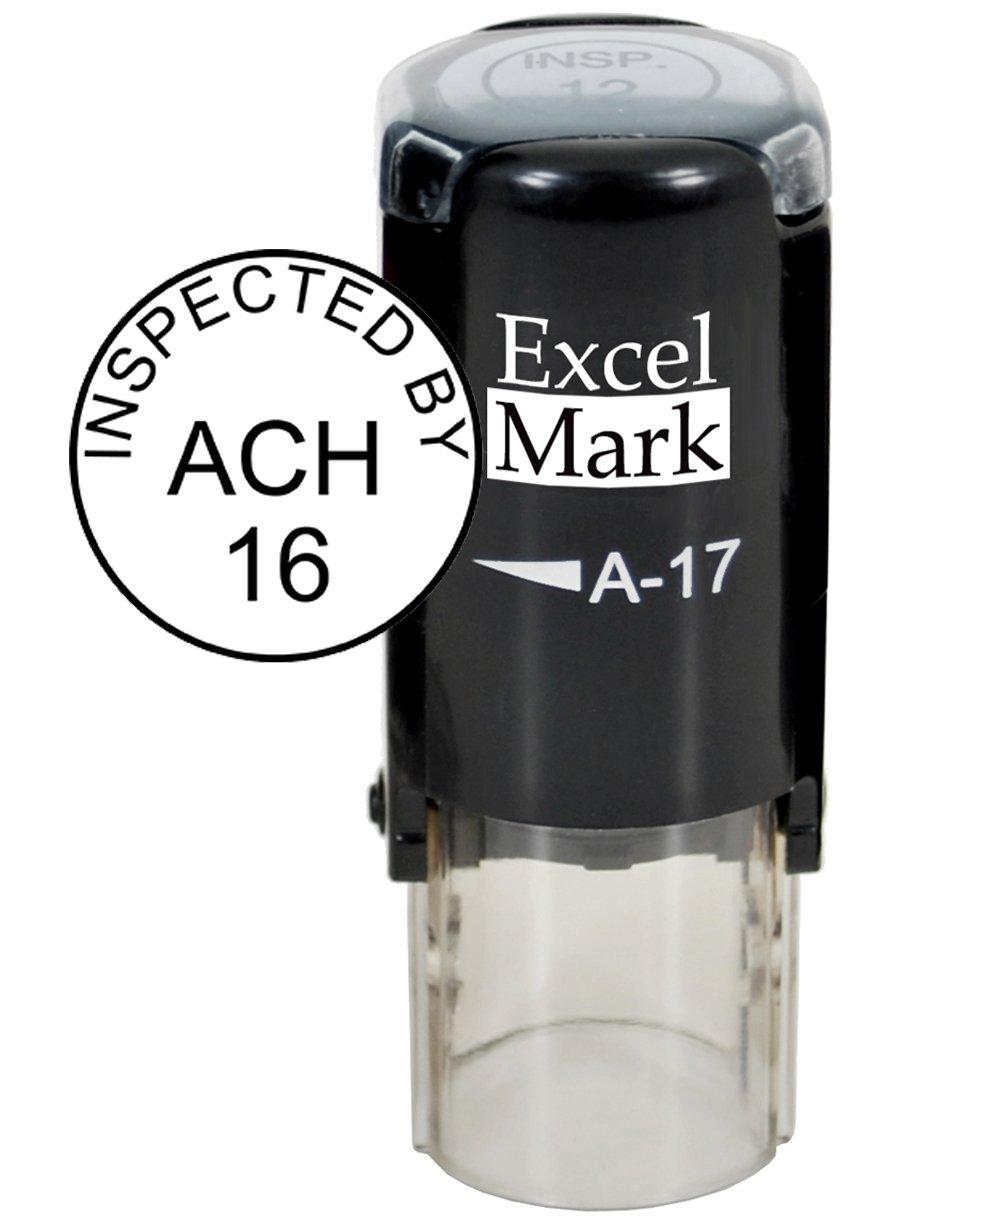 ExcelMark Custom Round Self Inking Inspection Stamp - 5/8'' Diameter (3 Lines)